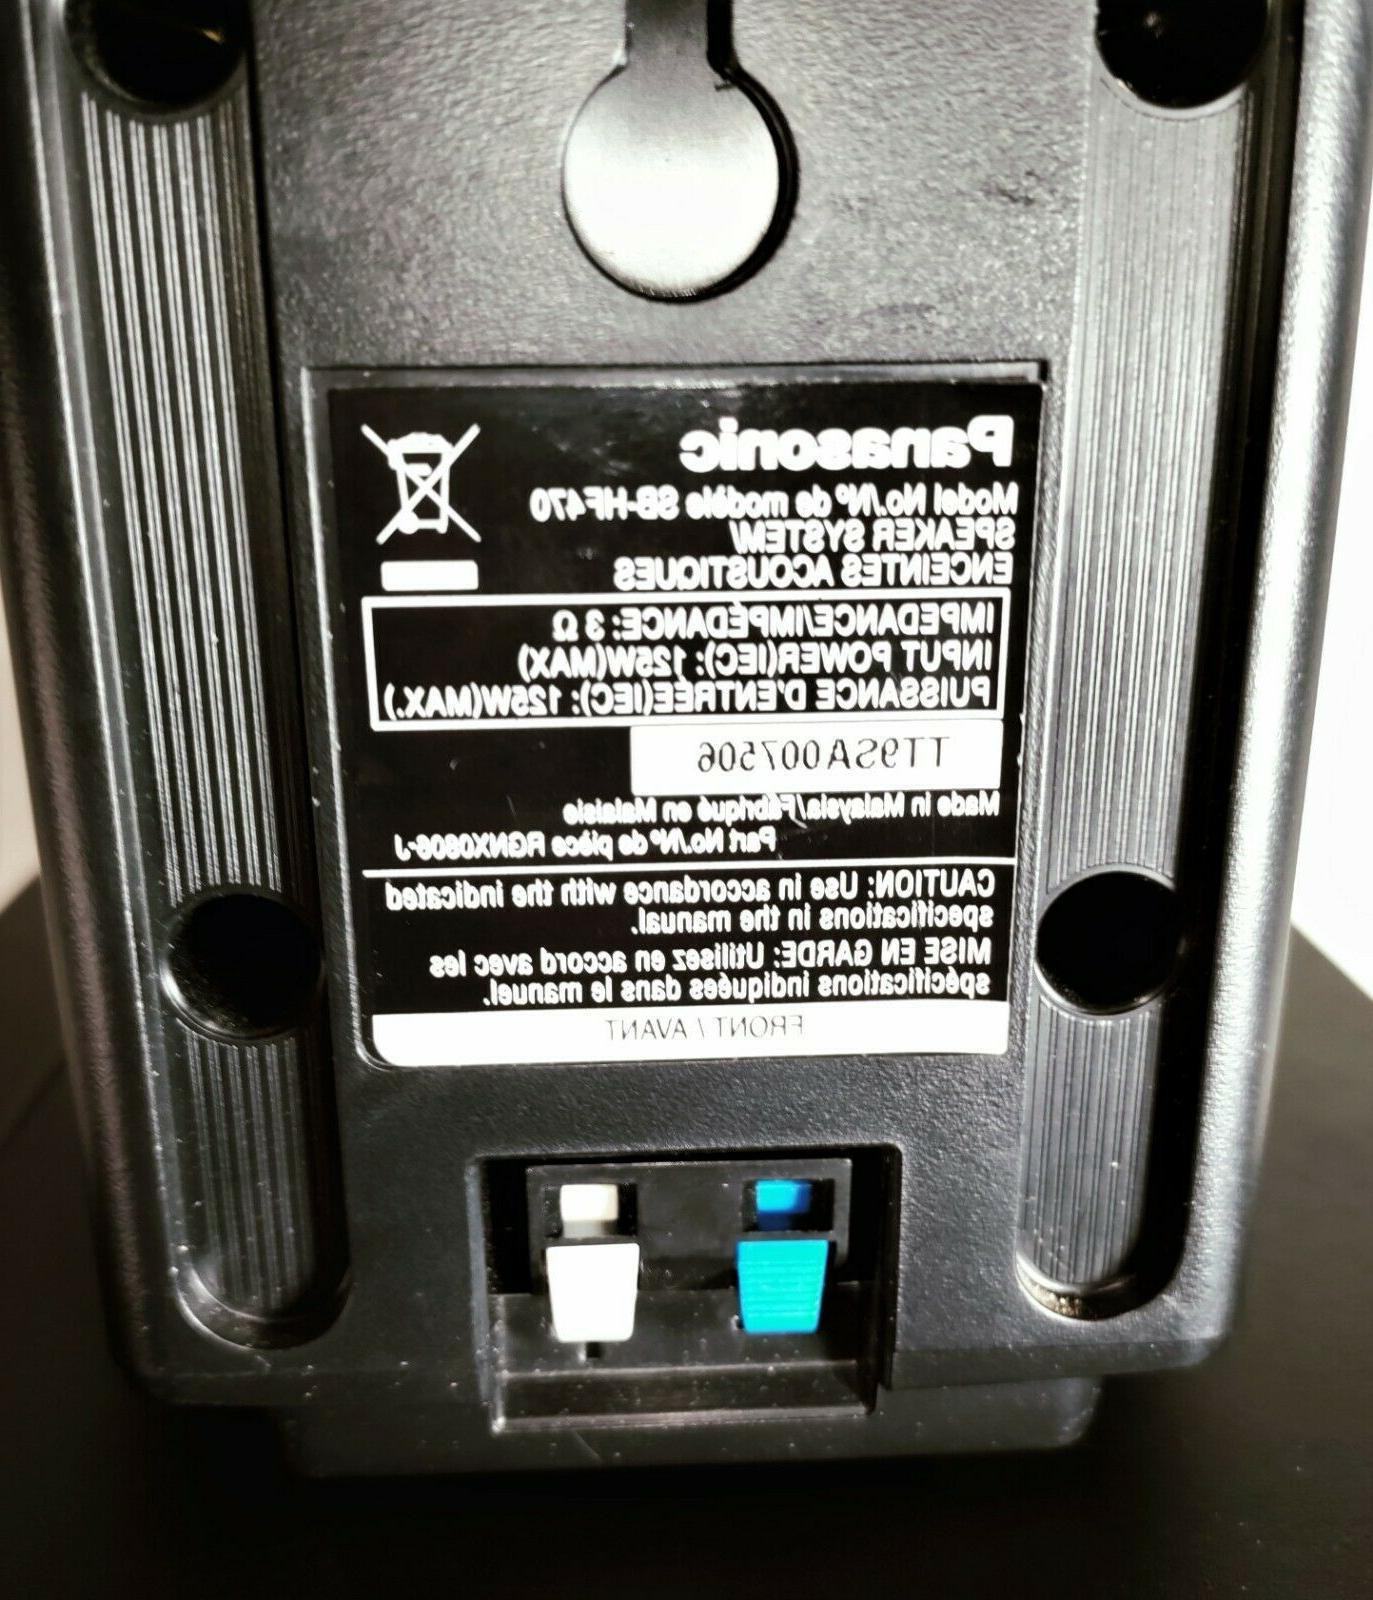 Panasonic Kelton w/6 Sound Speakers